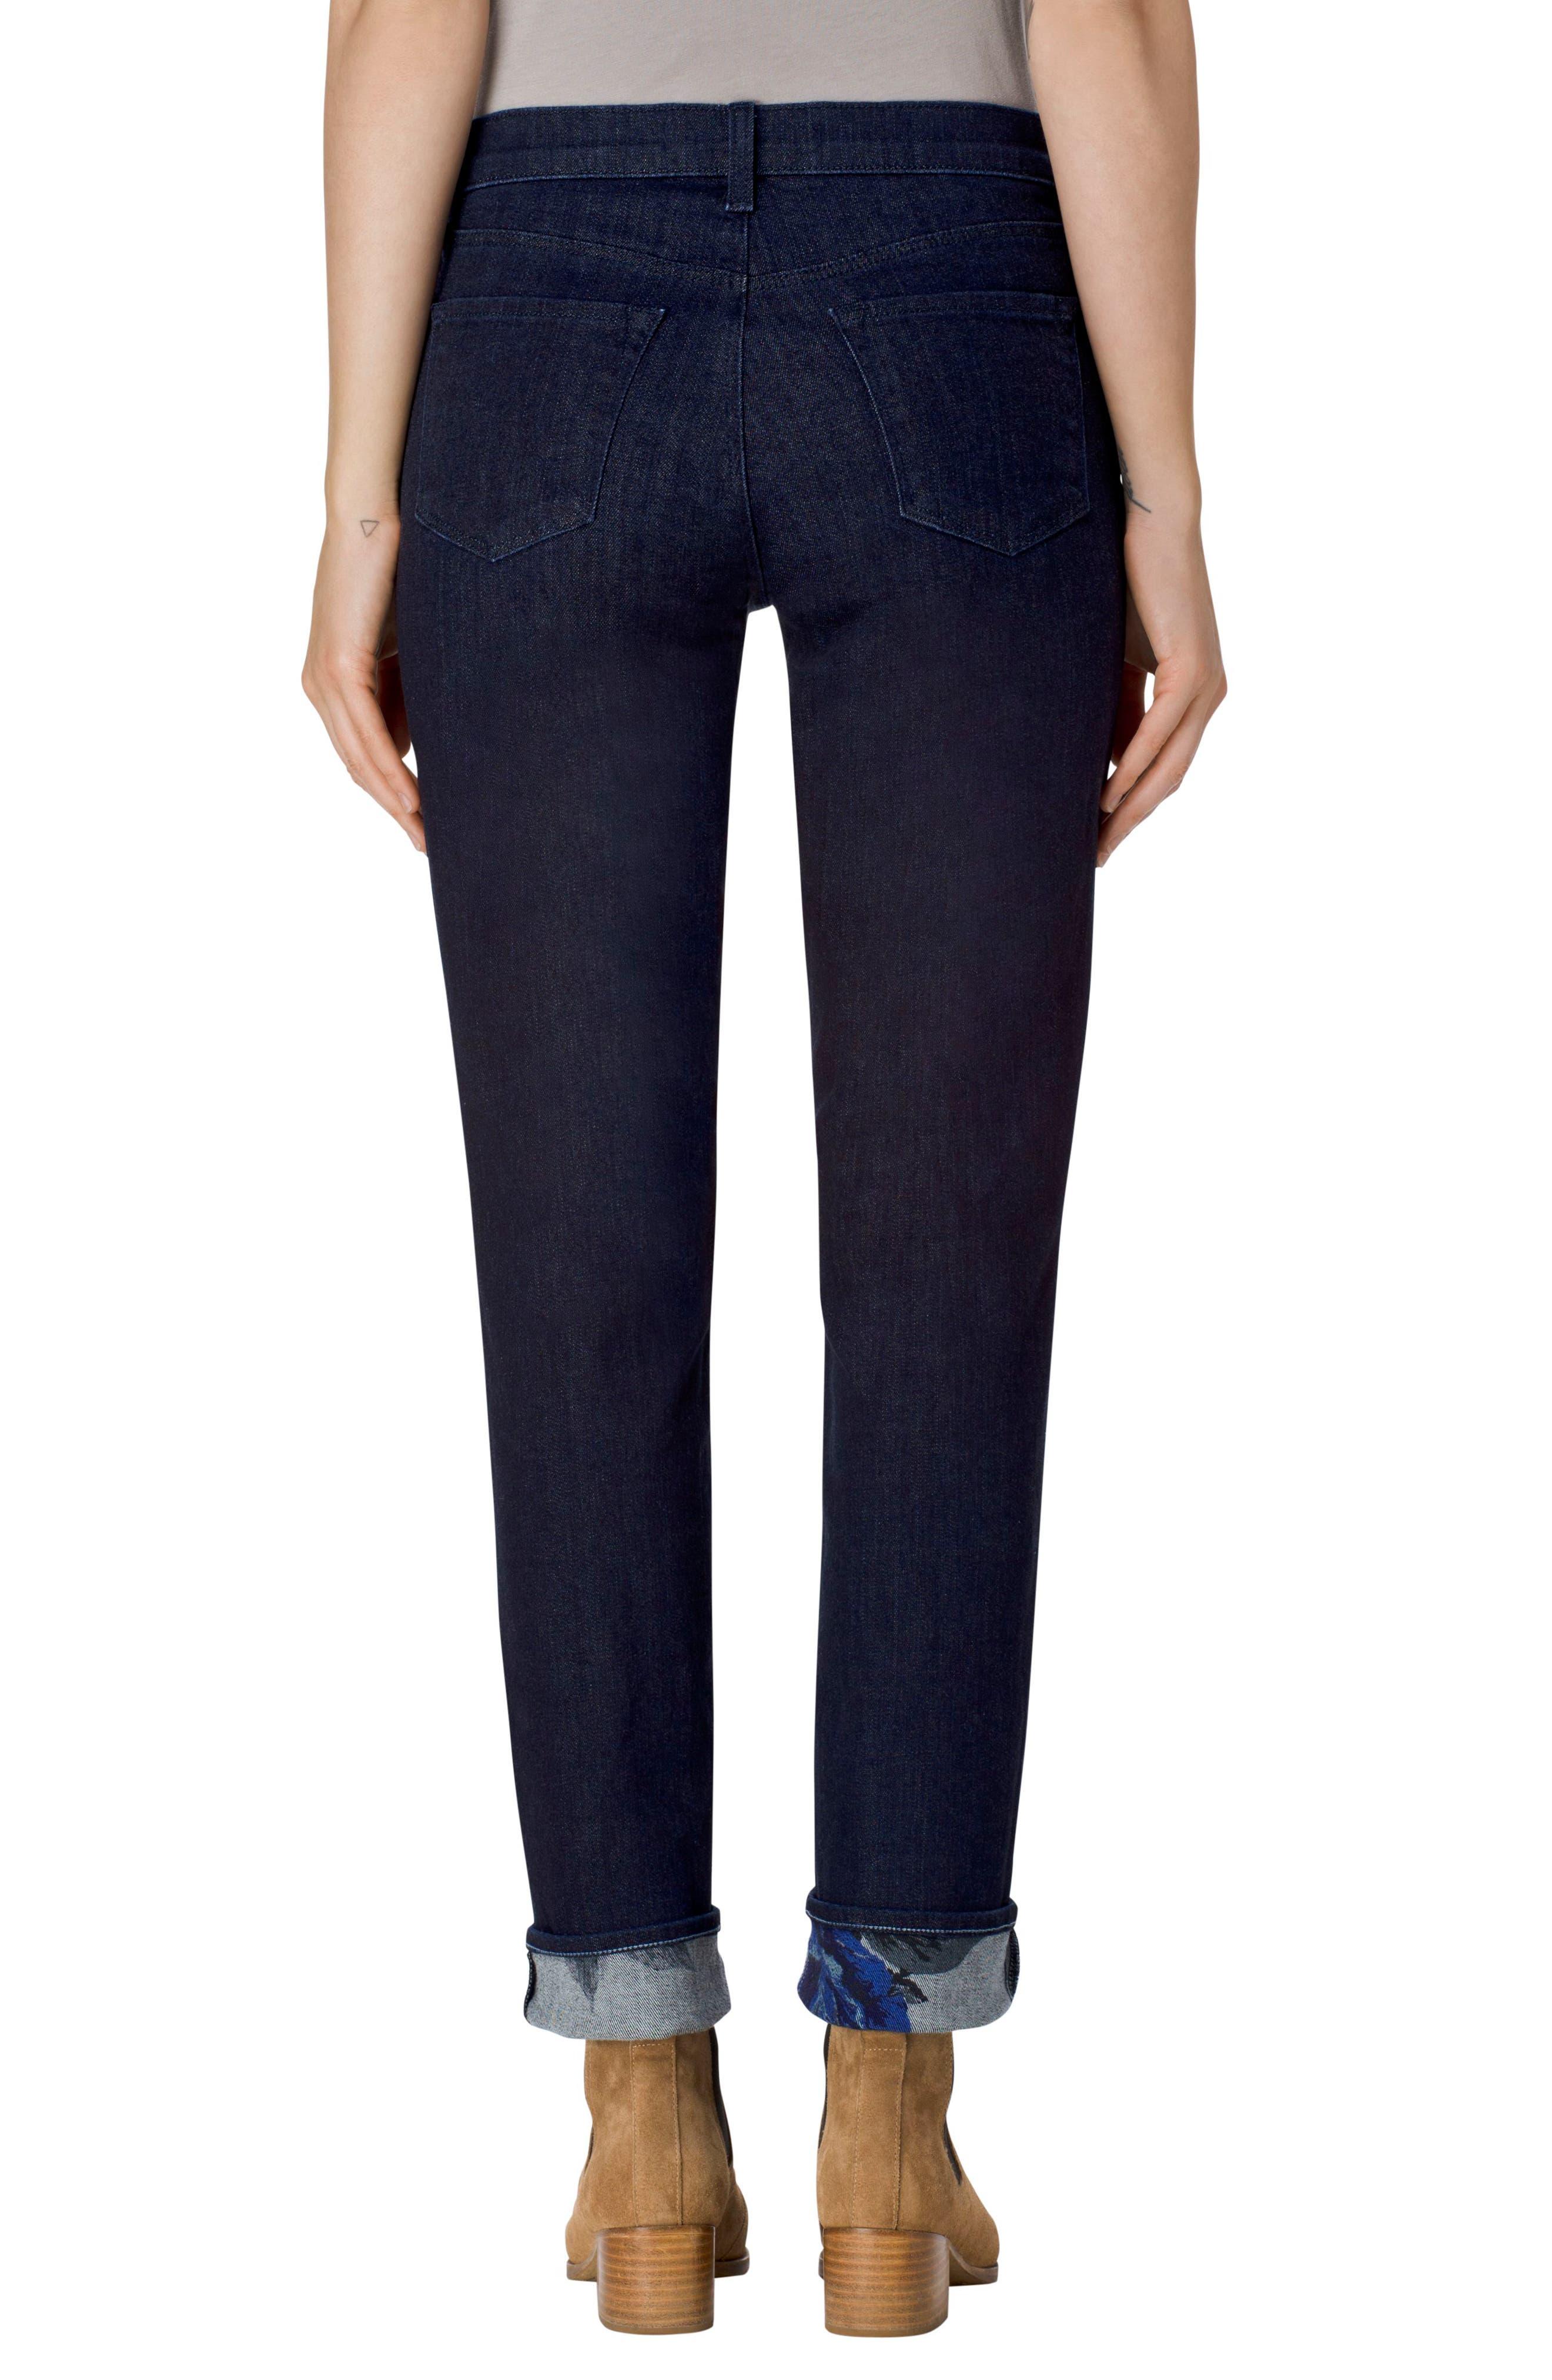 Alternate Image 2  - J Brand Maude Cigarette Leg Jeans (Corsage)